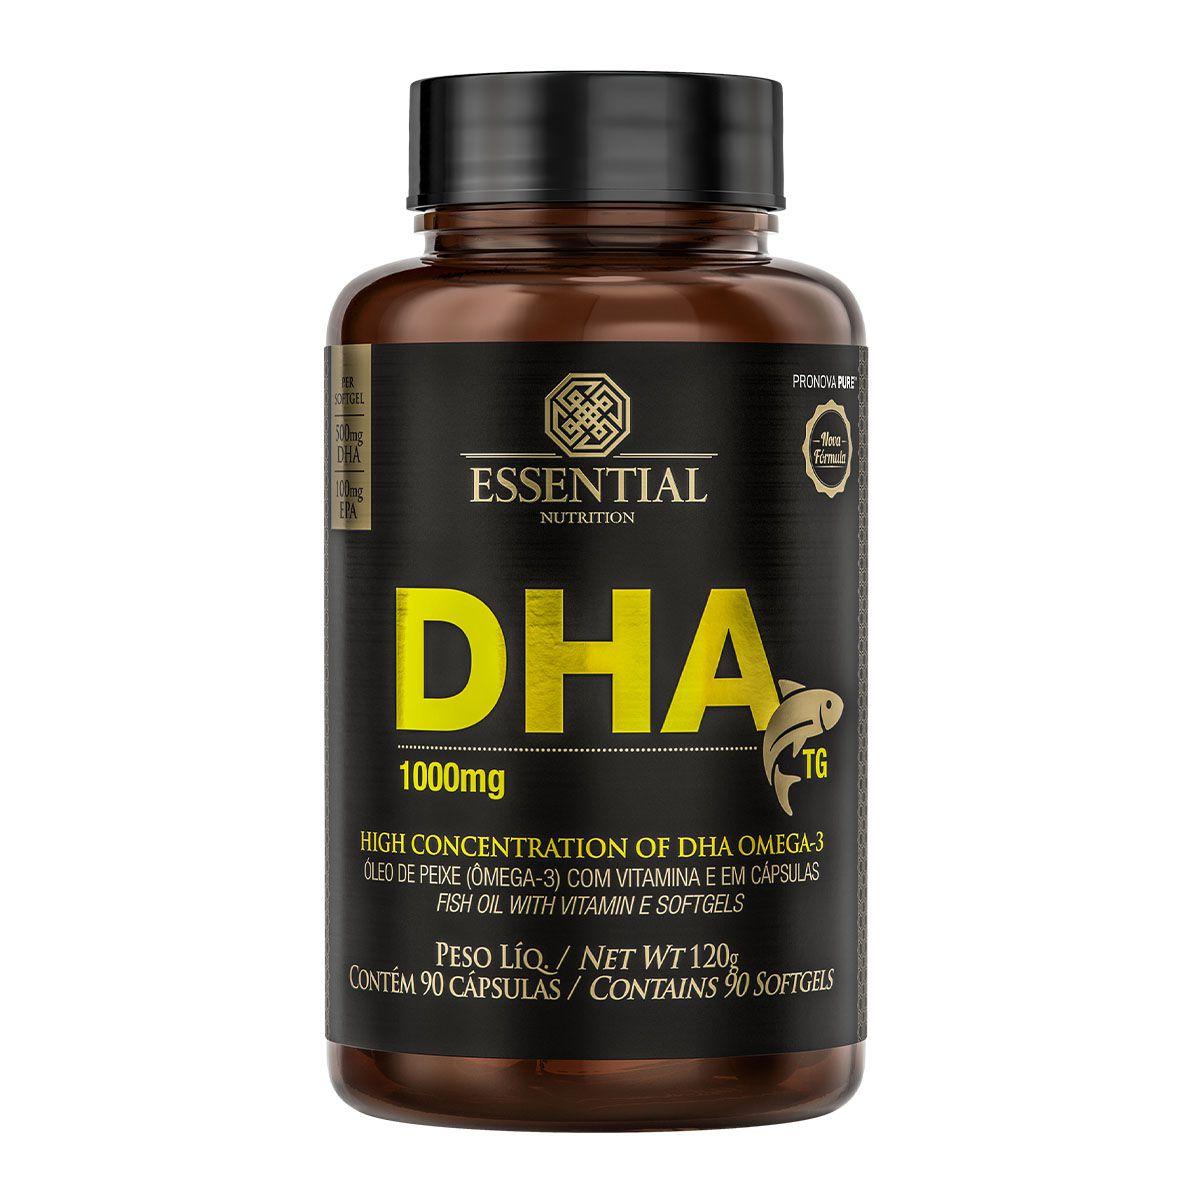 DHA 1000mg 90 Cápsulas - Essential Nutrition